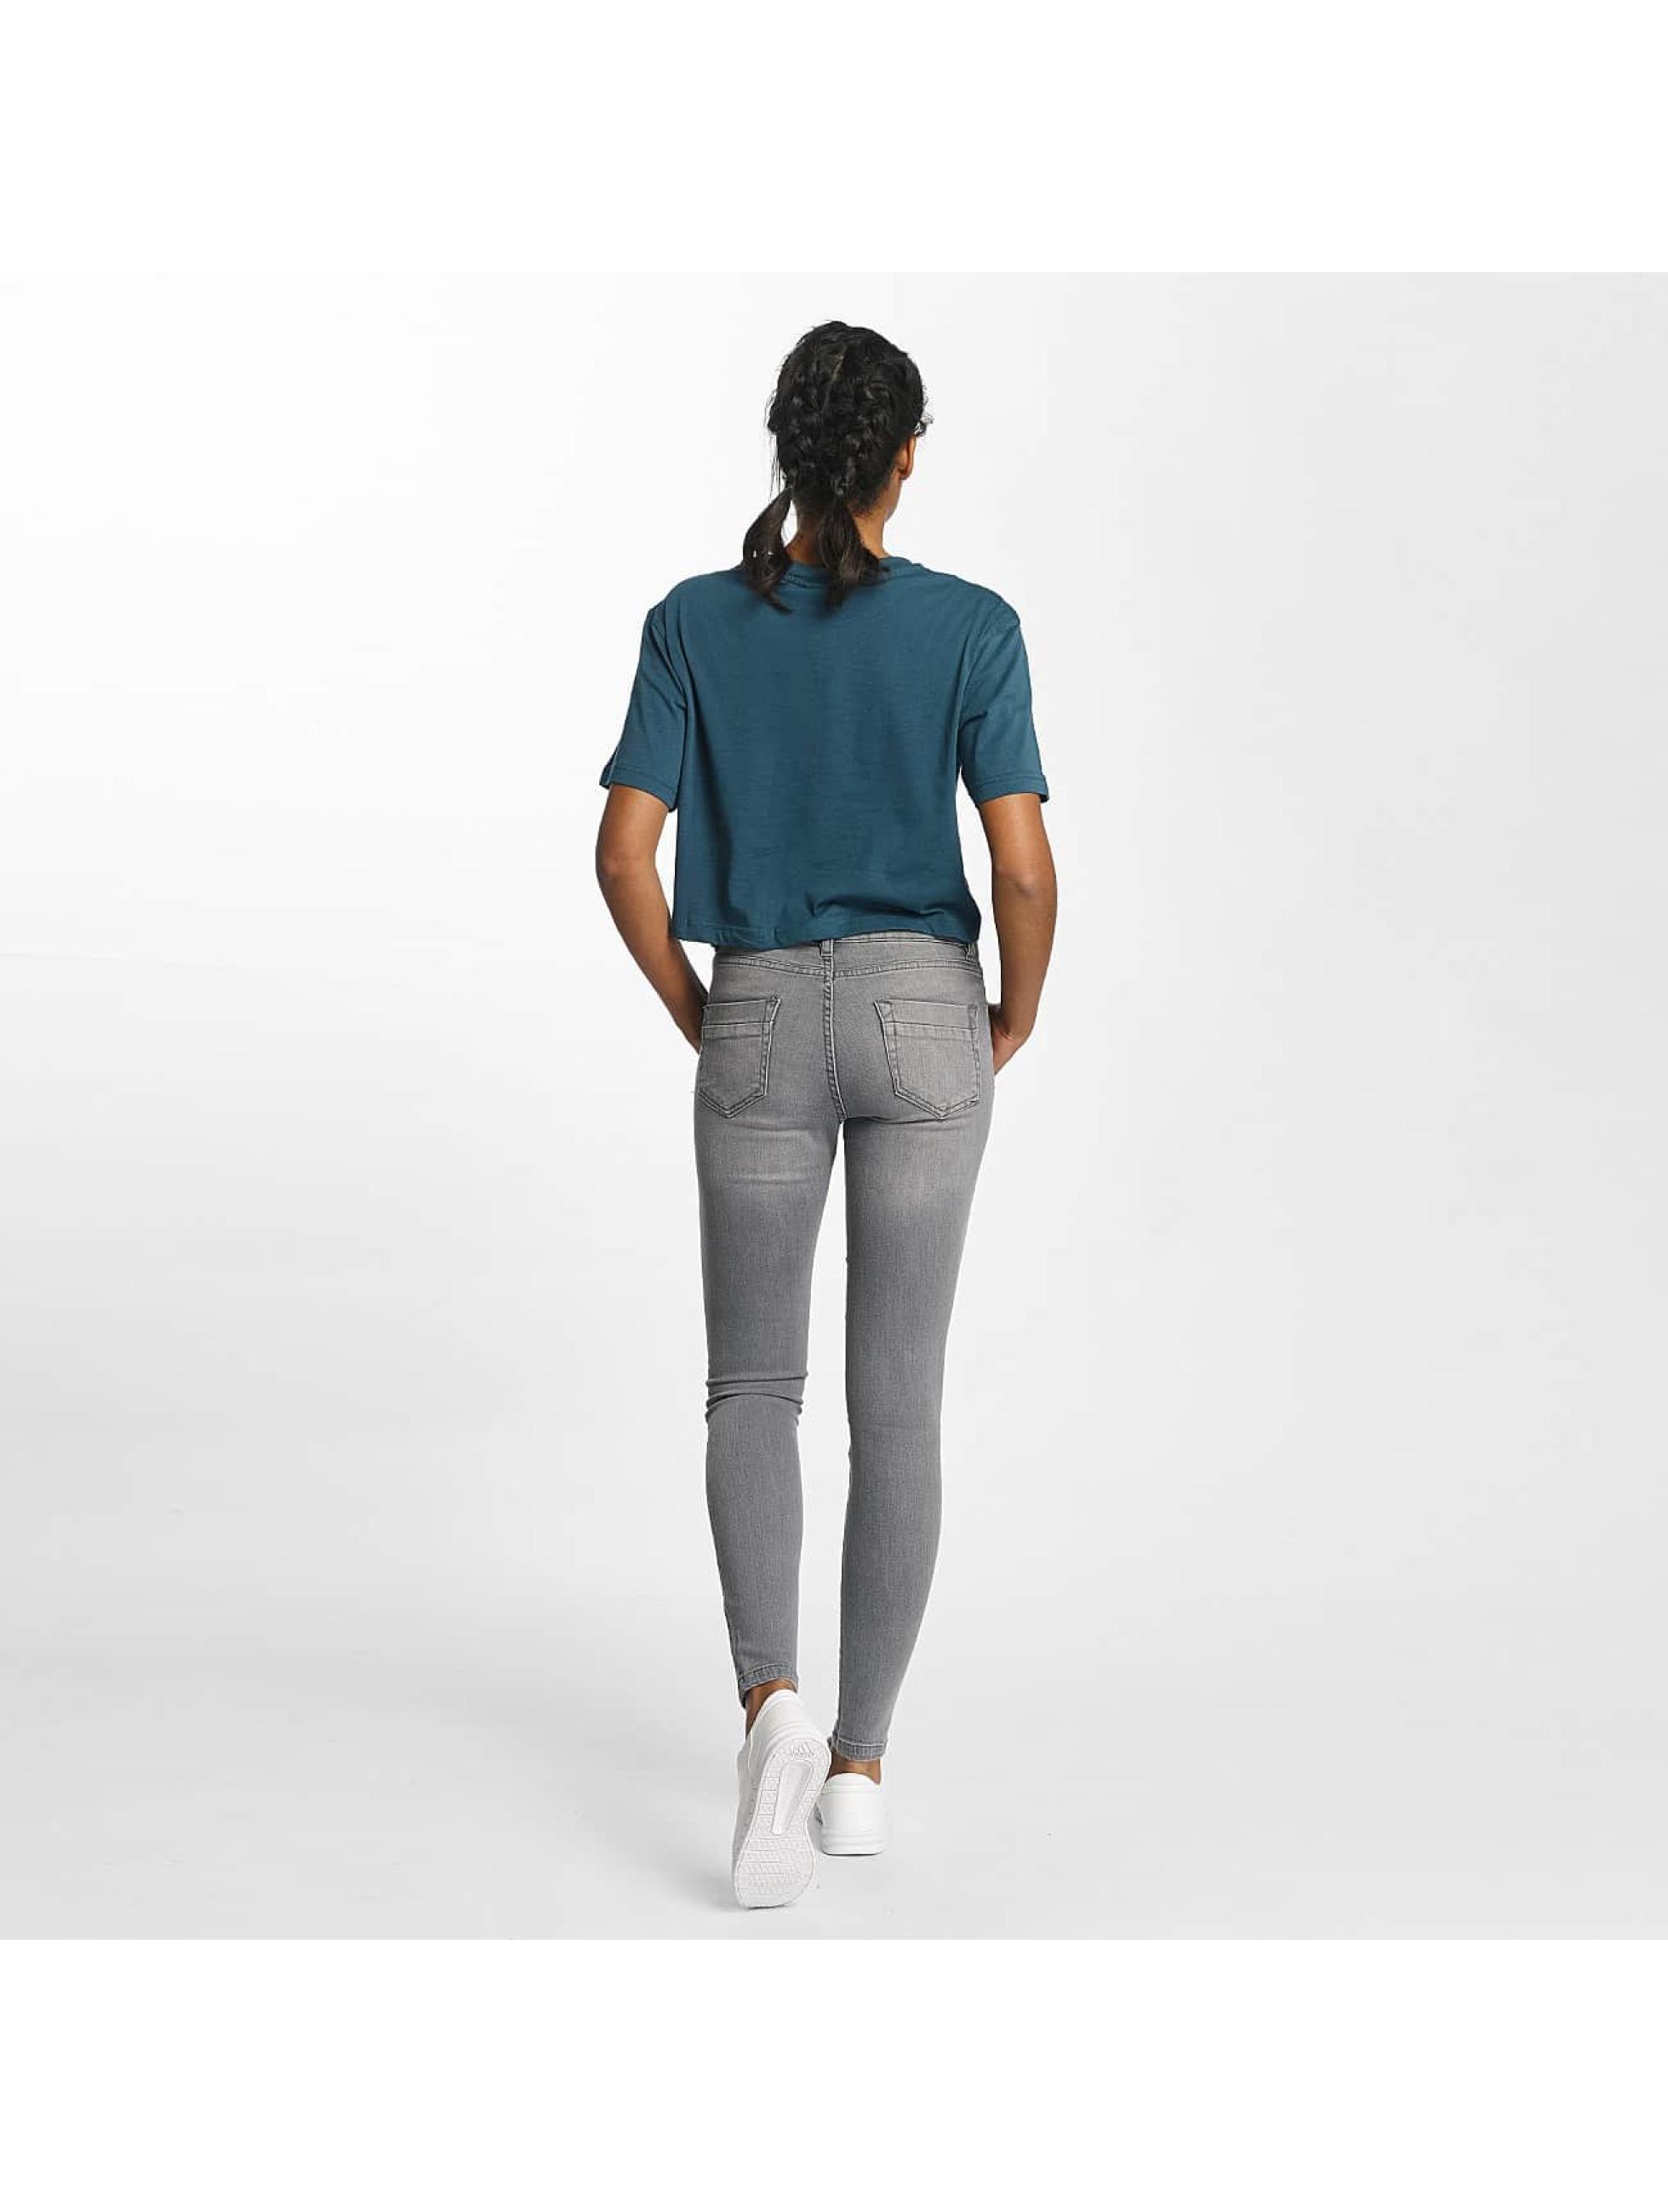 Urban Classics T-Shirt Ladies Oversized turquoise